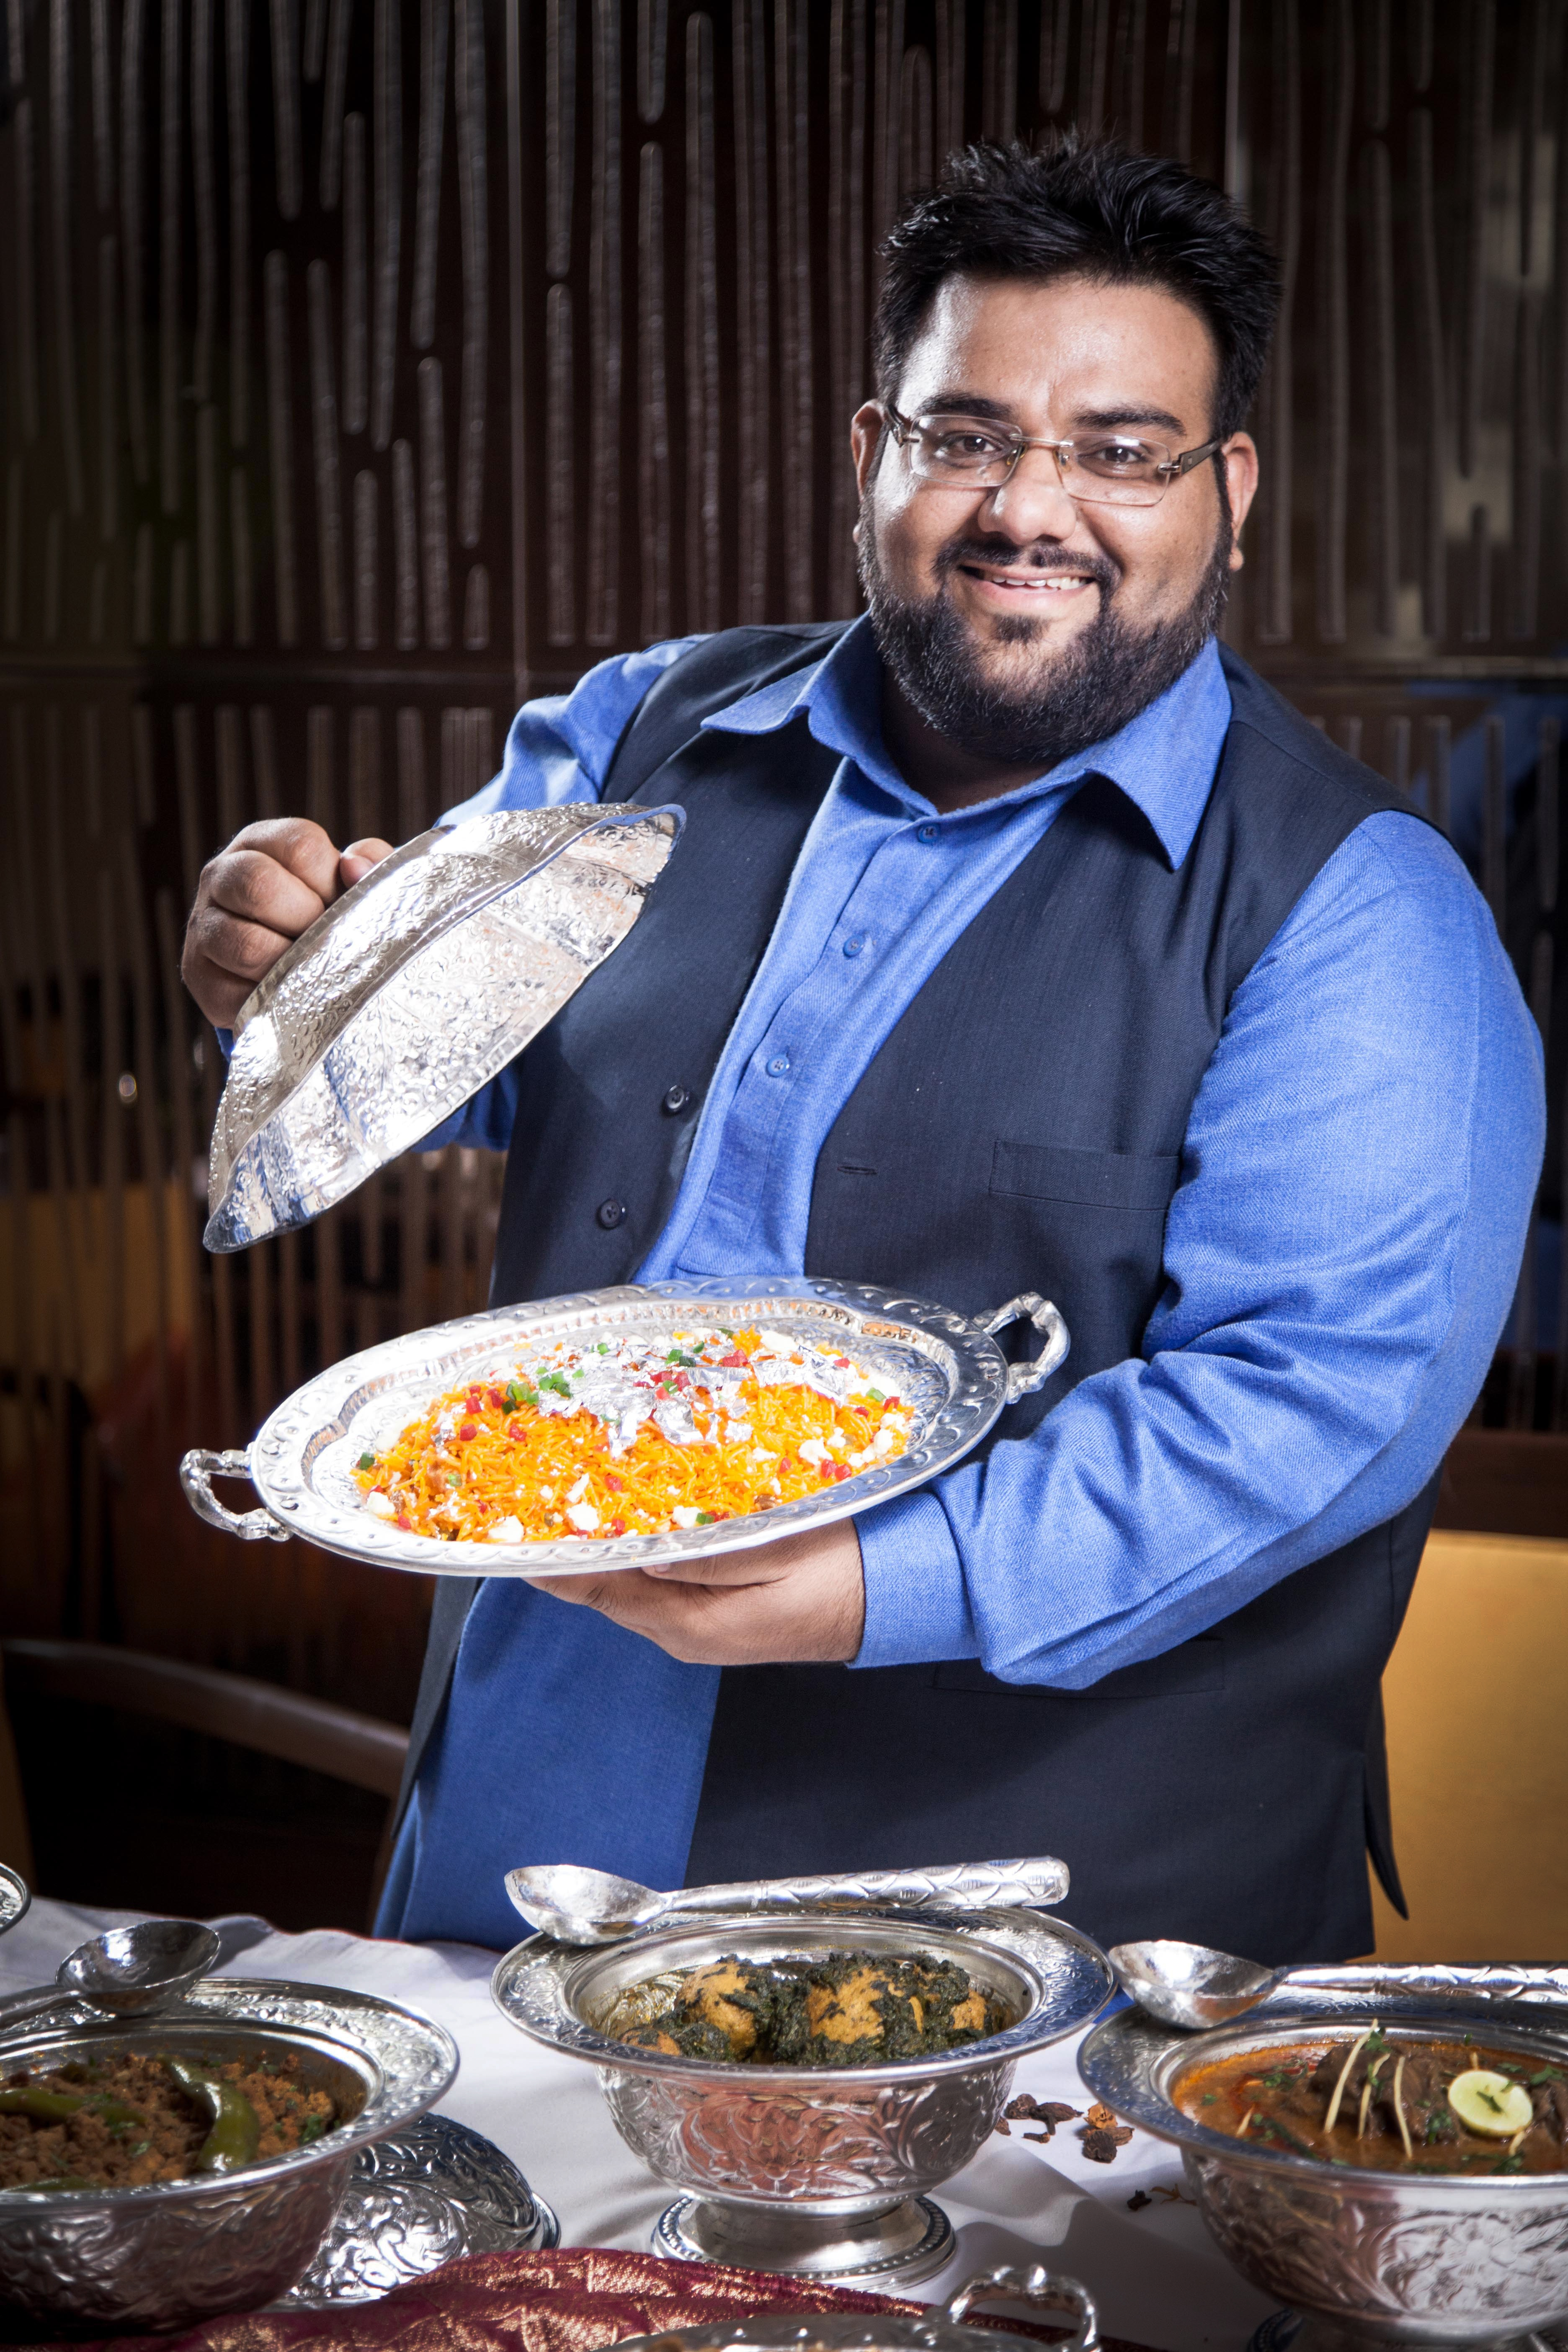 Chef Osama Jalali